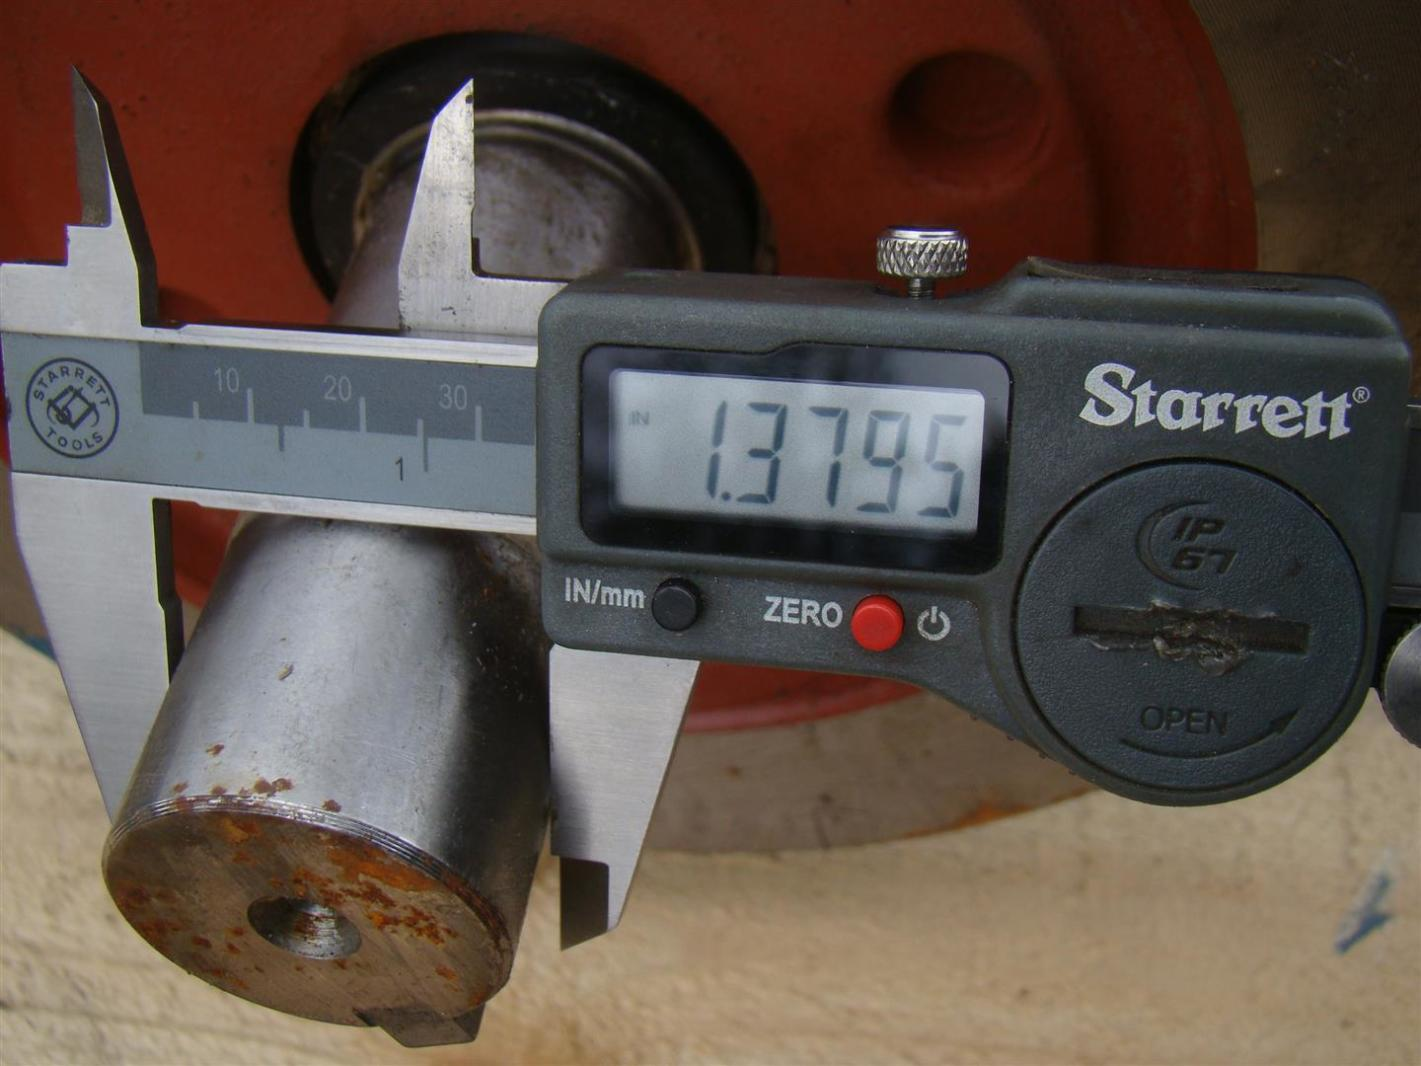 weg-iec-motor-wiring-diagram-480v-2  Pole Manual Motor Starter Wiring Diagram on for reversing, ge cr306, start stop jog, eaton cutler hammer, heavy duty,